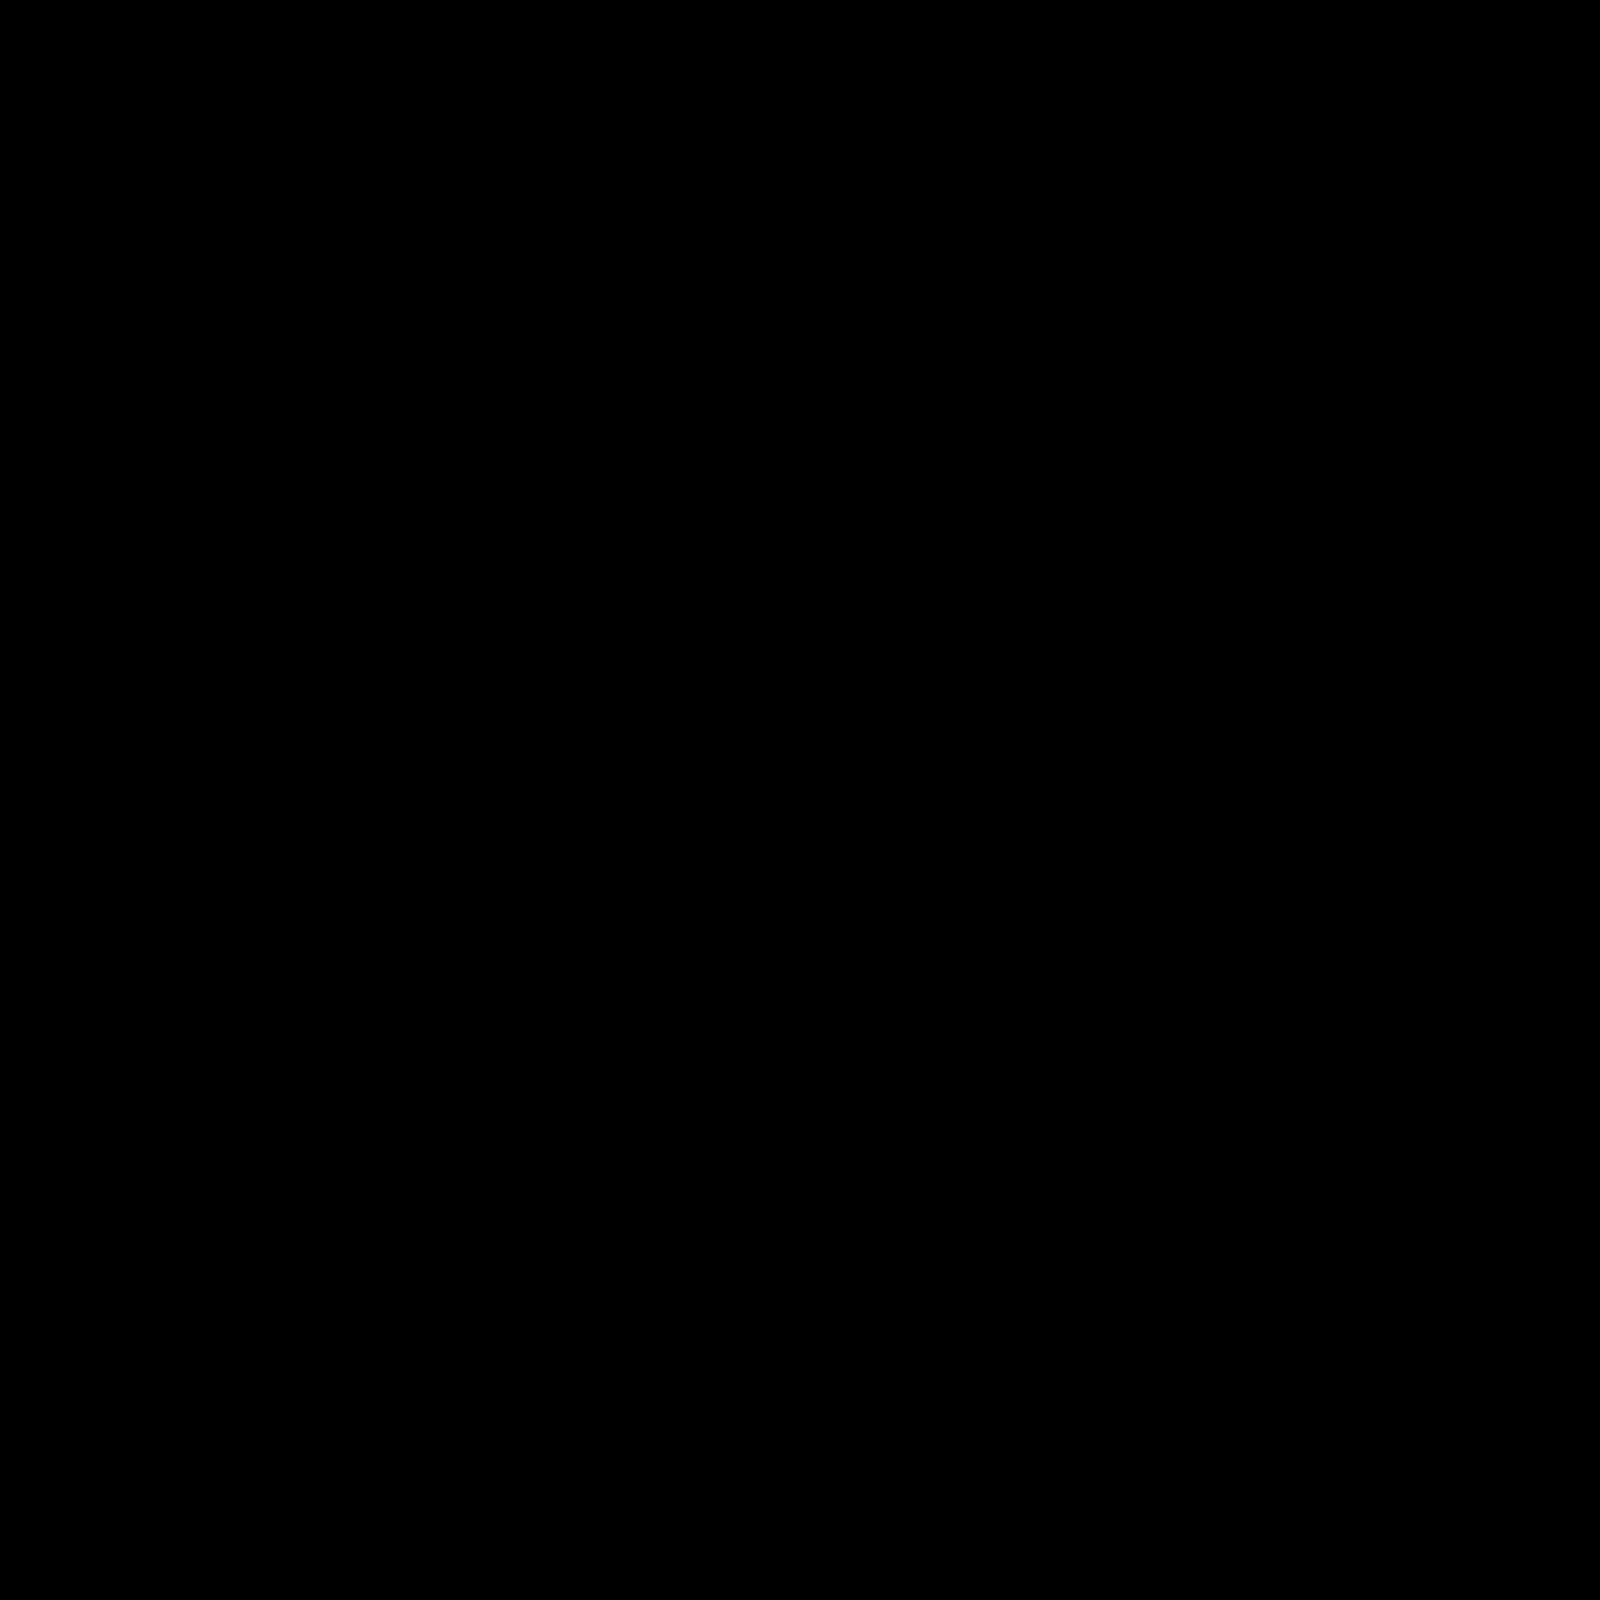 Subaru Filled icon